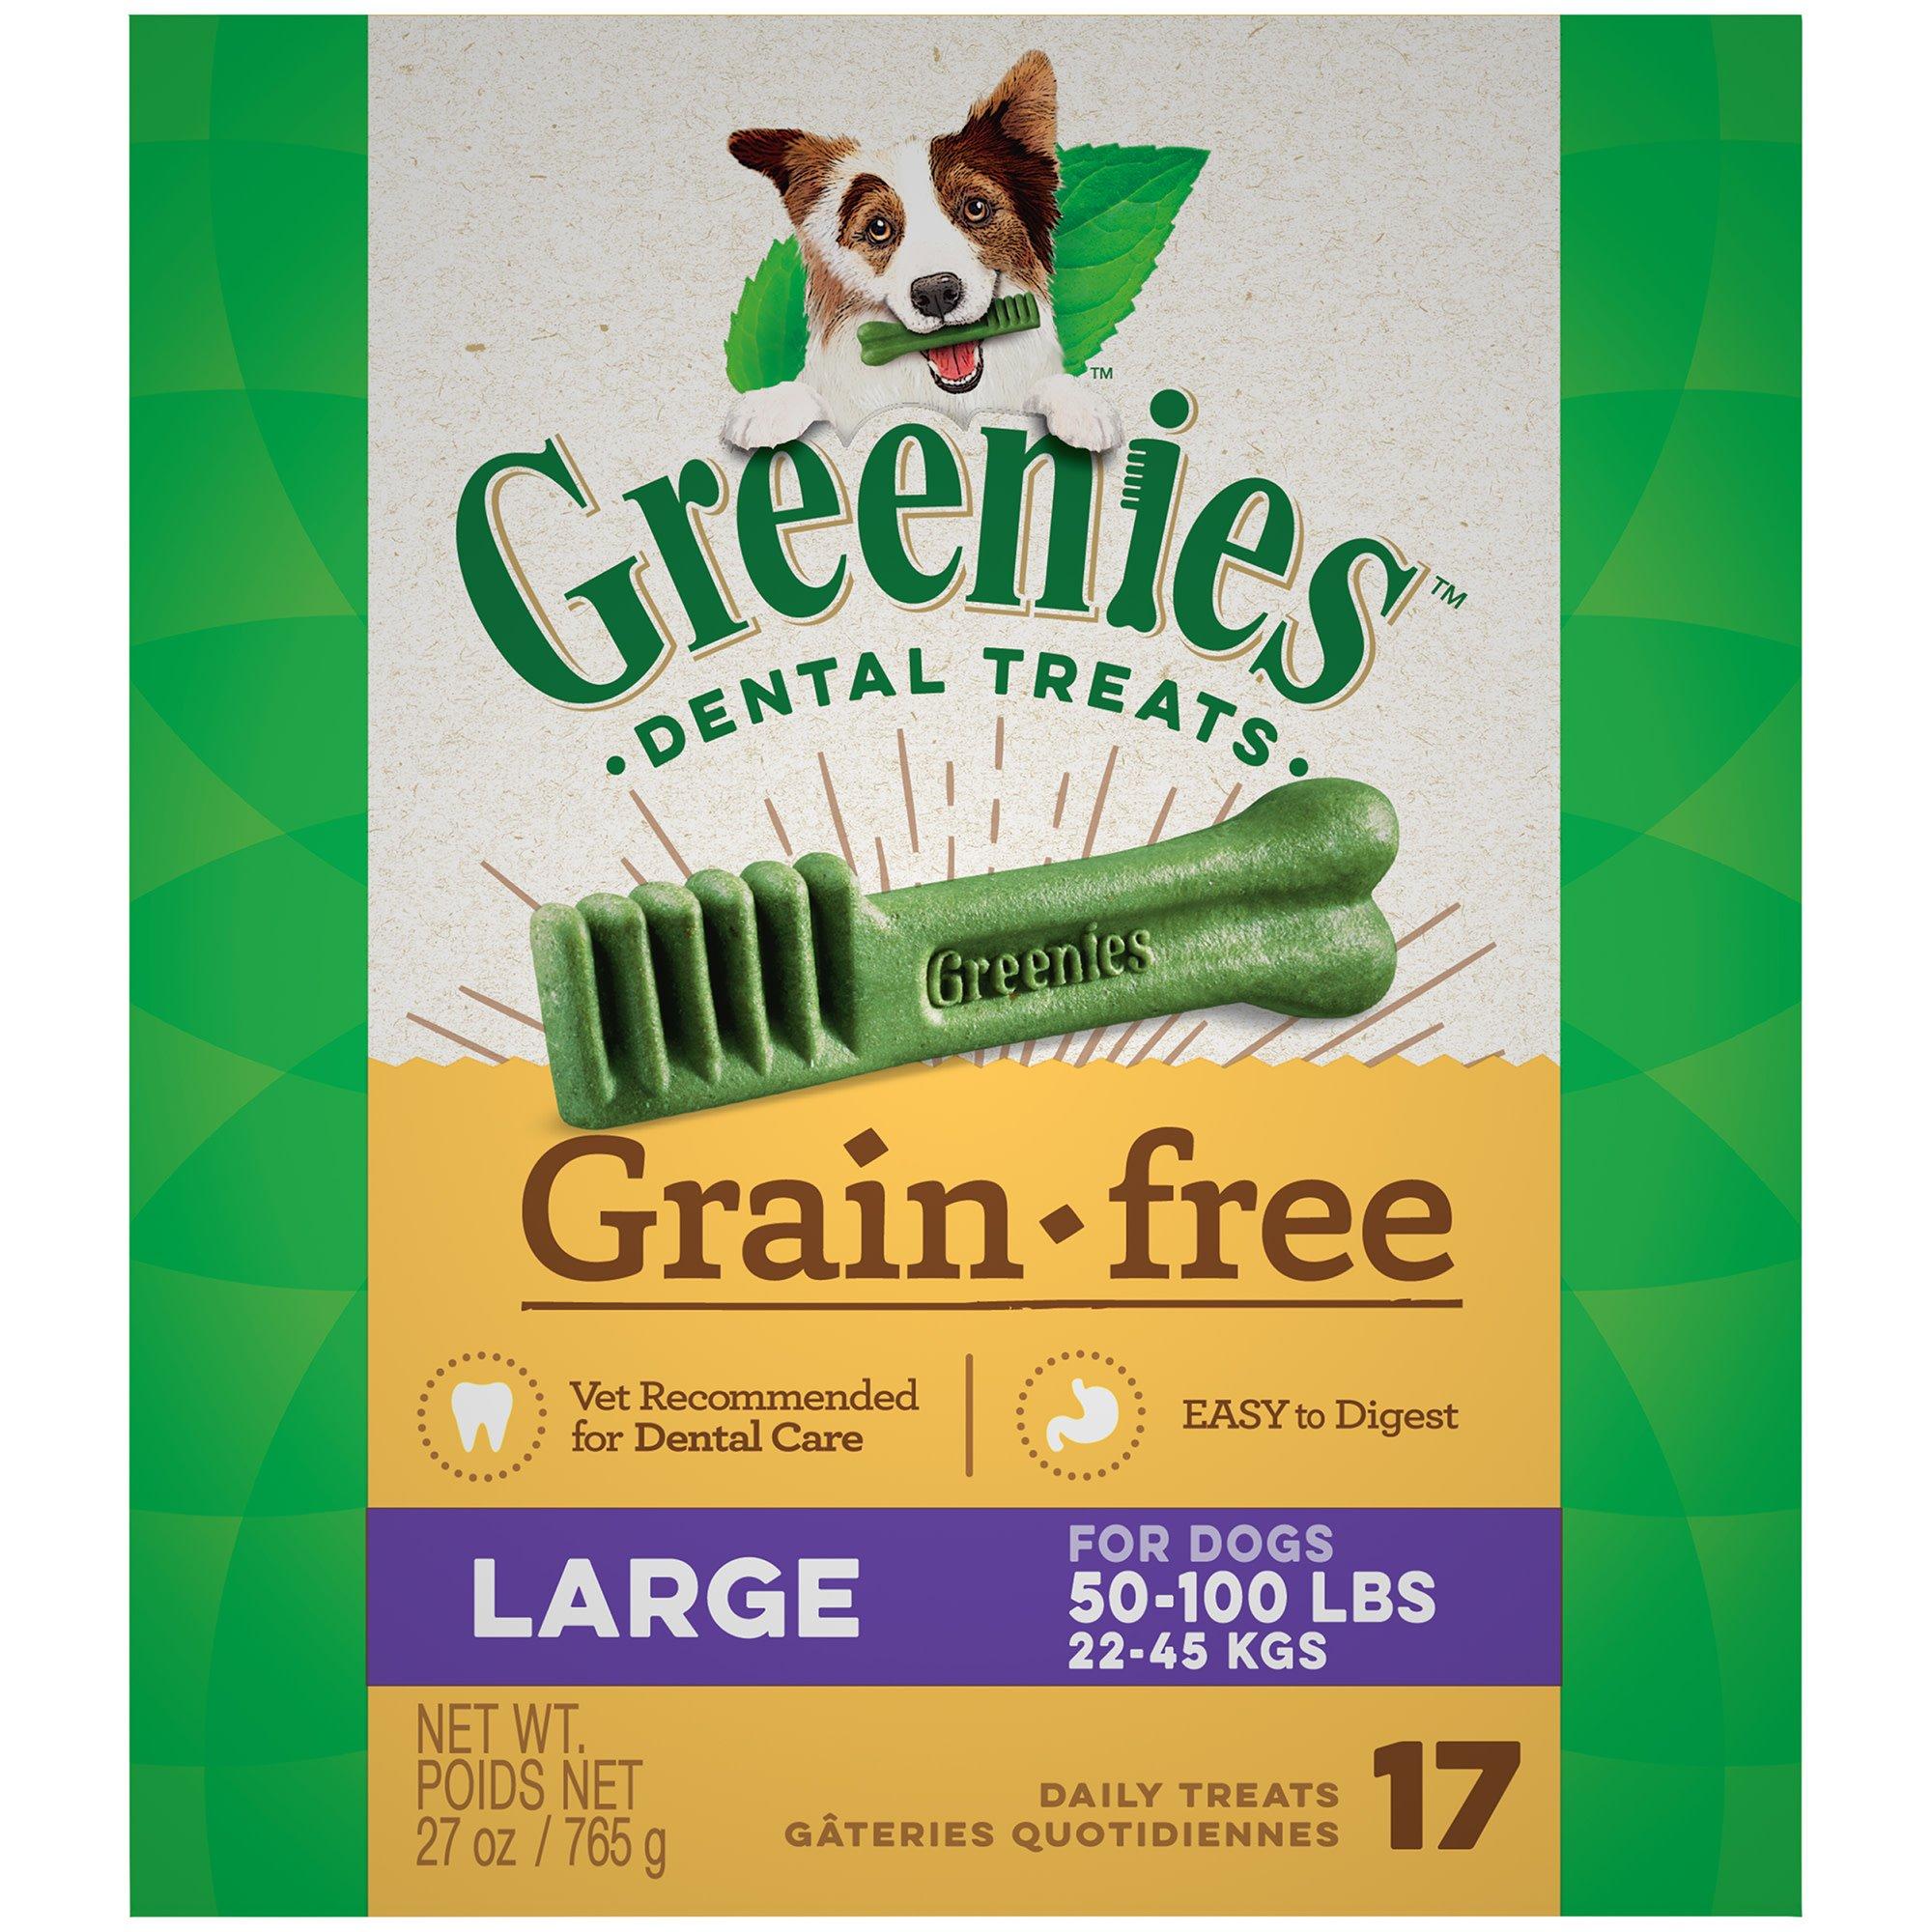 Greenies Grain Free Large Dental Treats